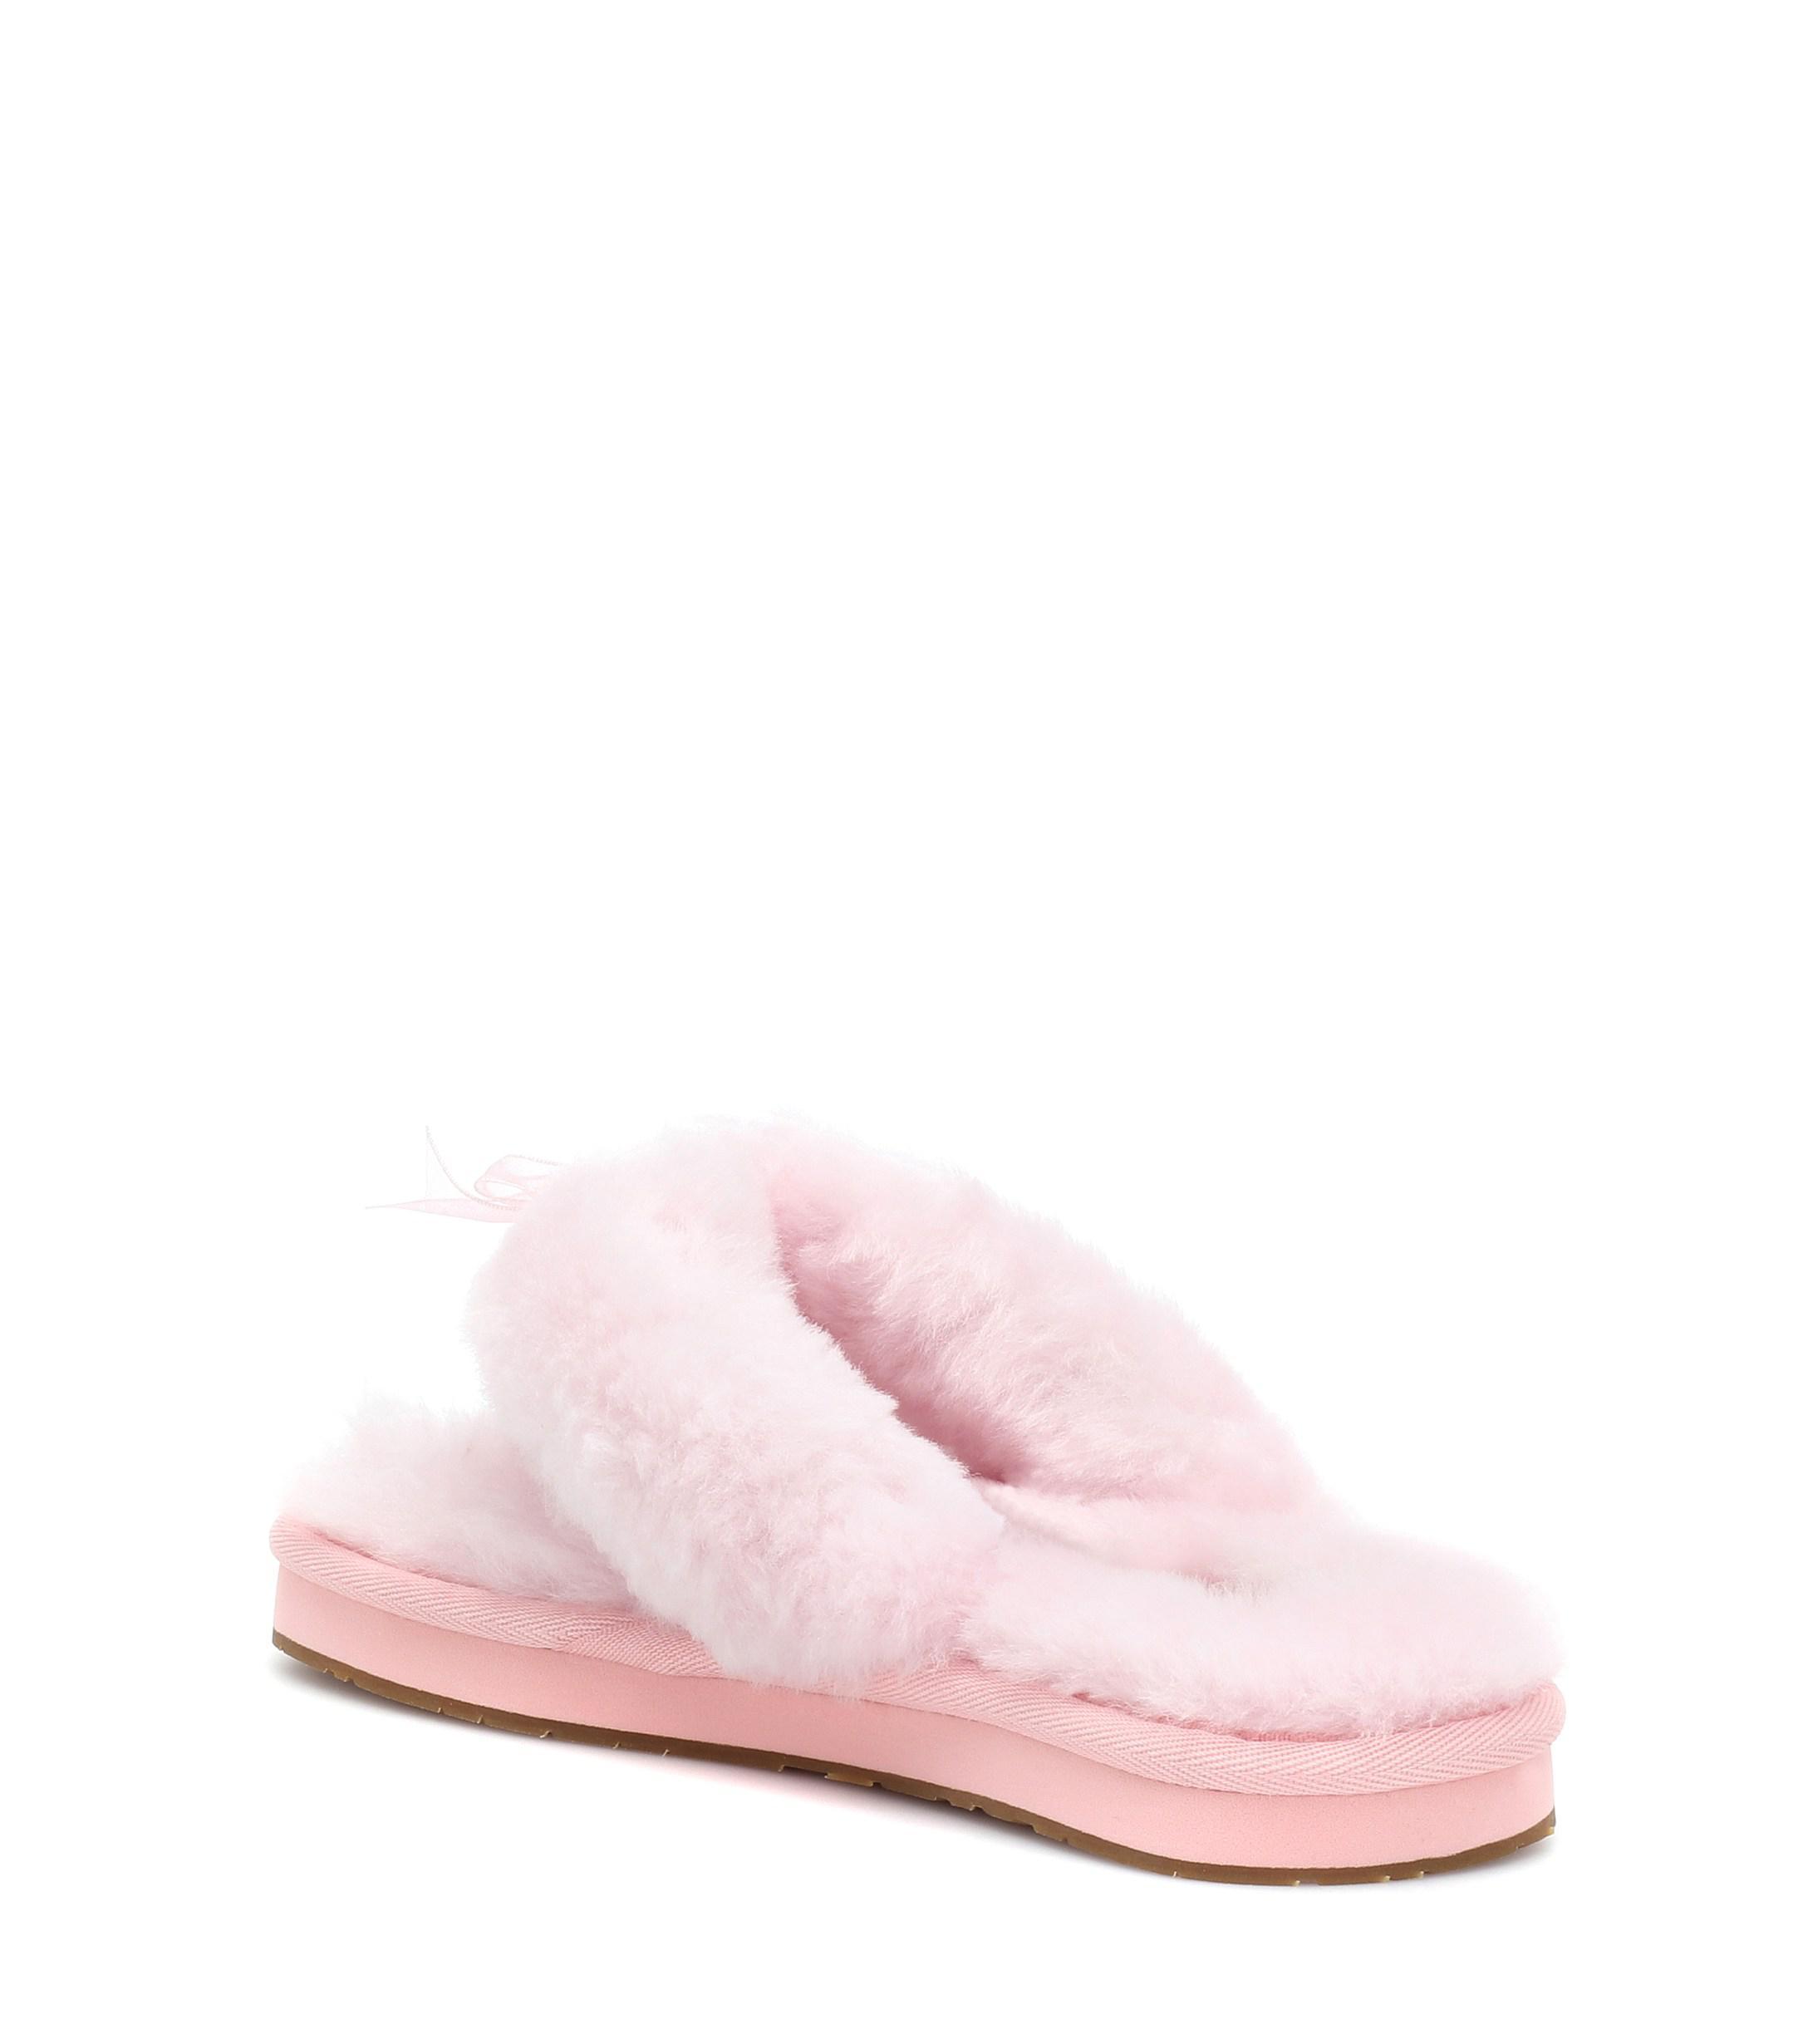 54c05b94b43 Lyst - UGG Fluff Flip Flop Iii Slippers in Pink